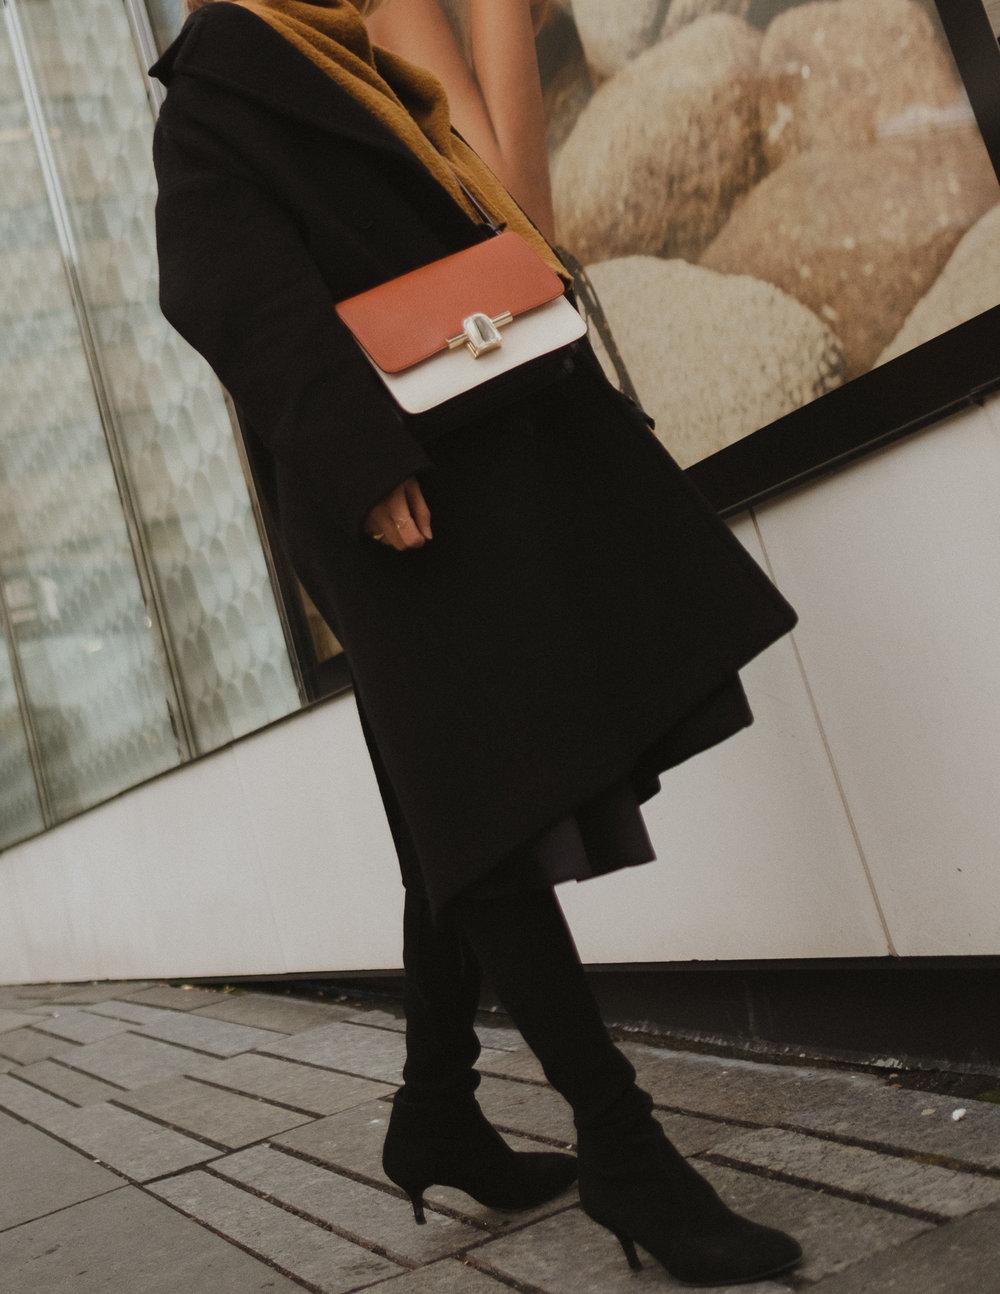 massimo-dutti-handbag.jpg